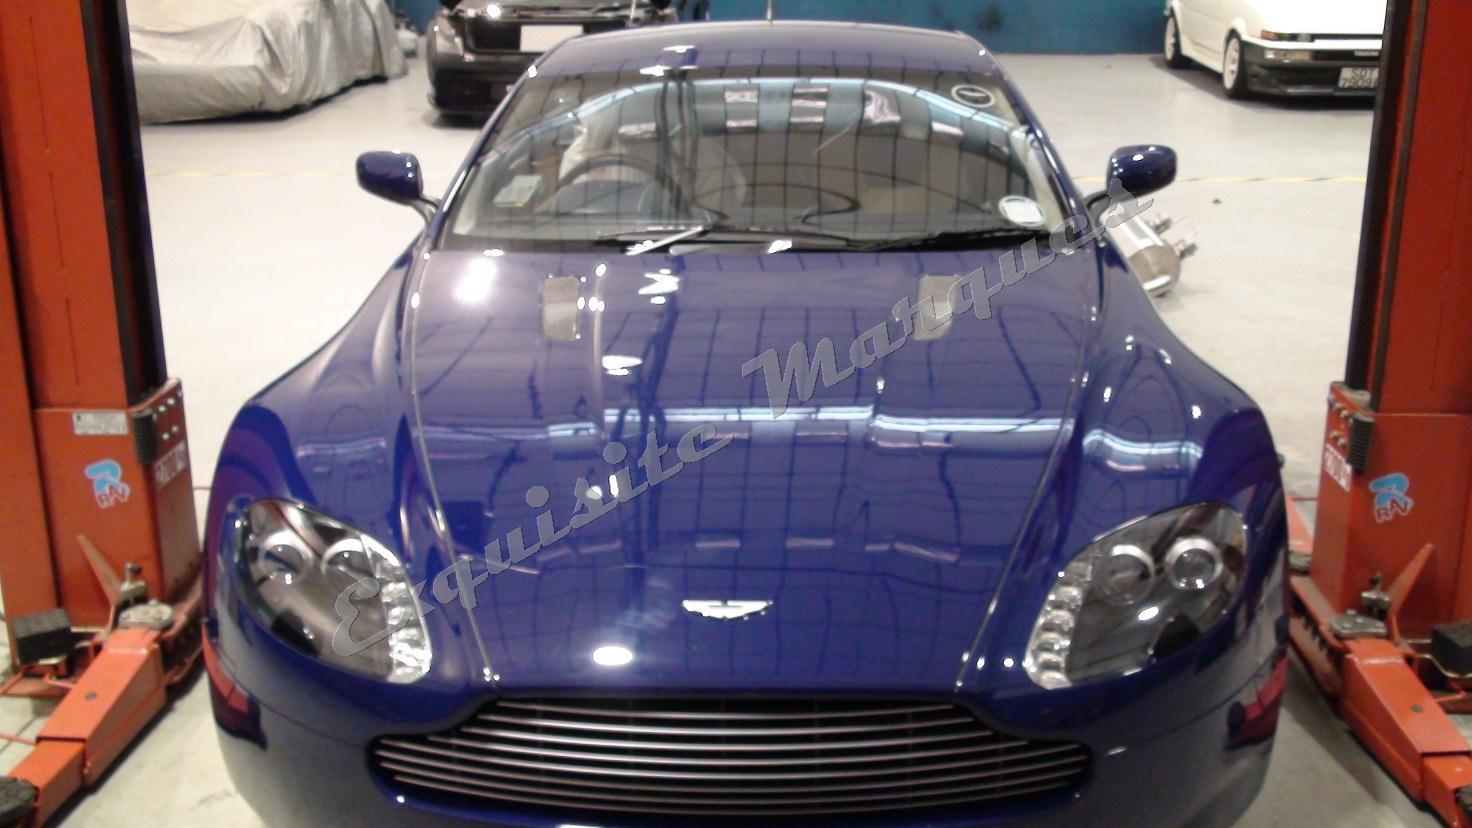 exquisite marques: aston martin vantage quicksilver exhaust system